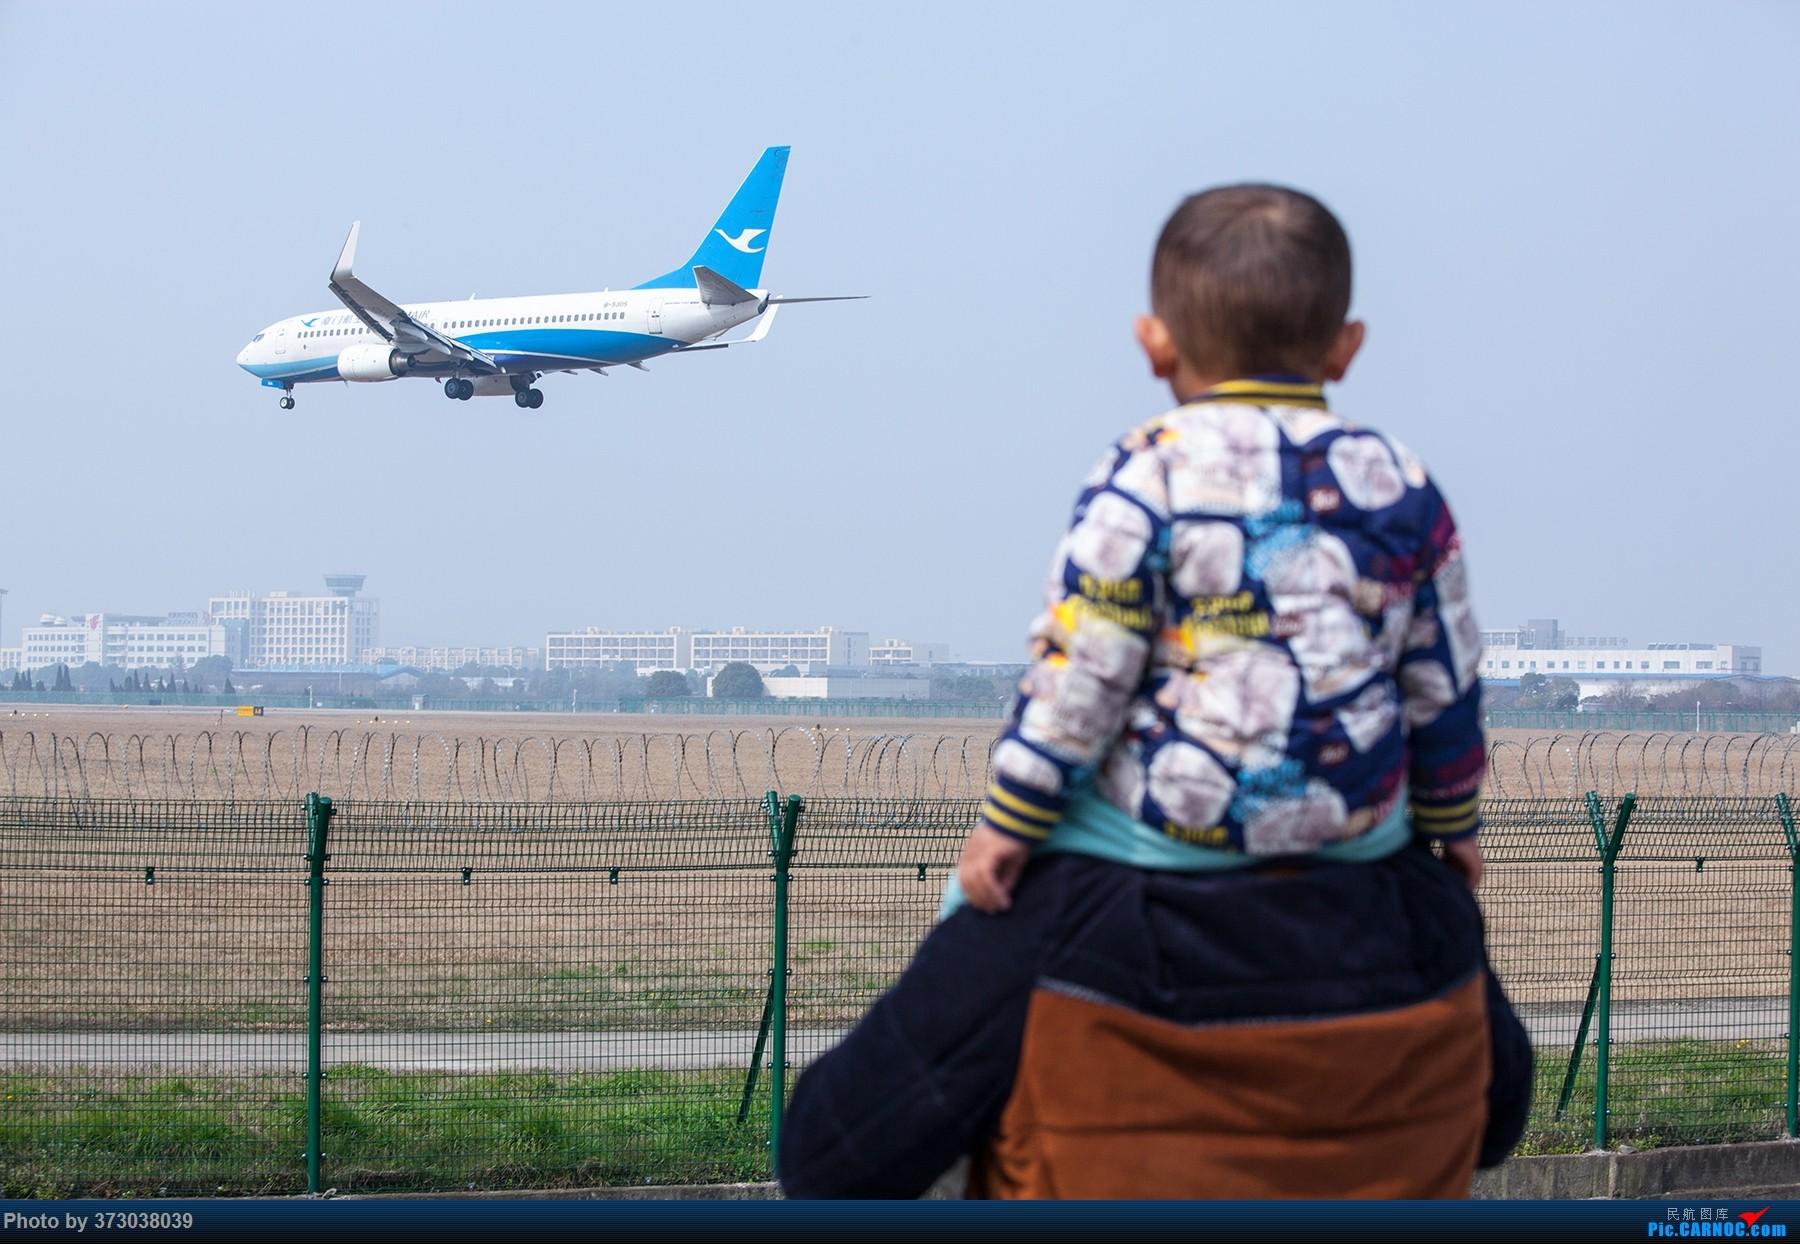 Re:[原创]【杭州飞友会】A320Neo迪士尼杭州萧山机场拍机班门弄斧记 BOEING 737-800 B-5305 中国杭州萧山国际机场